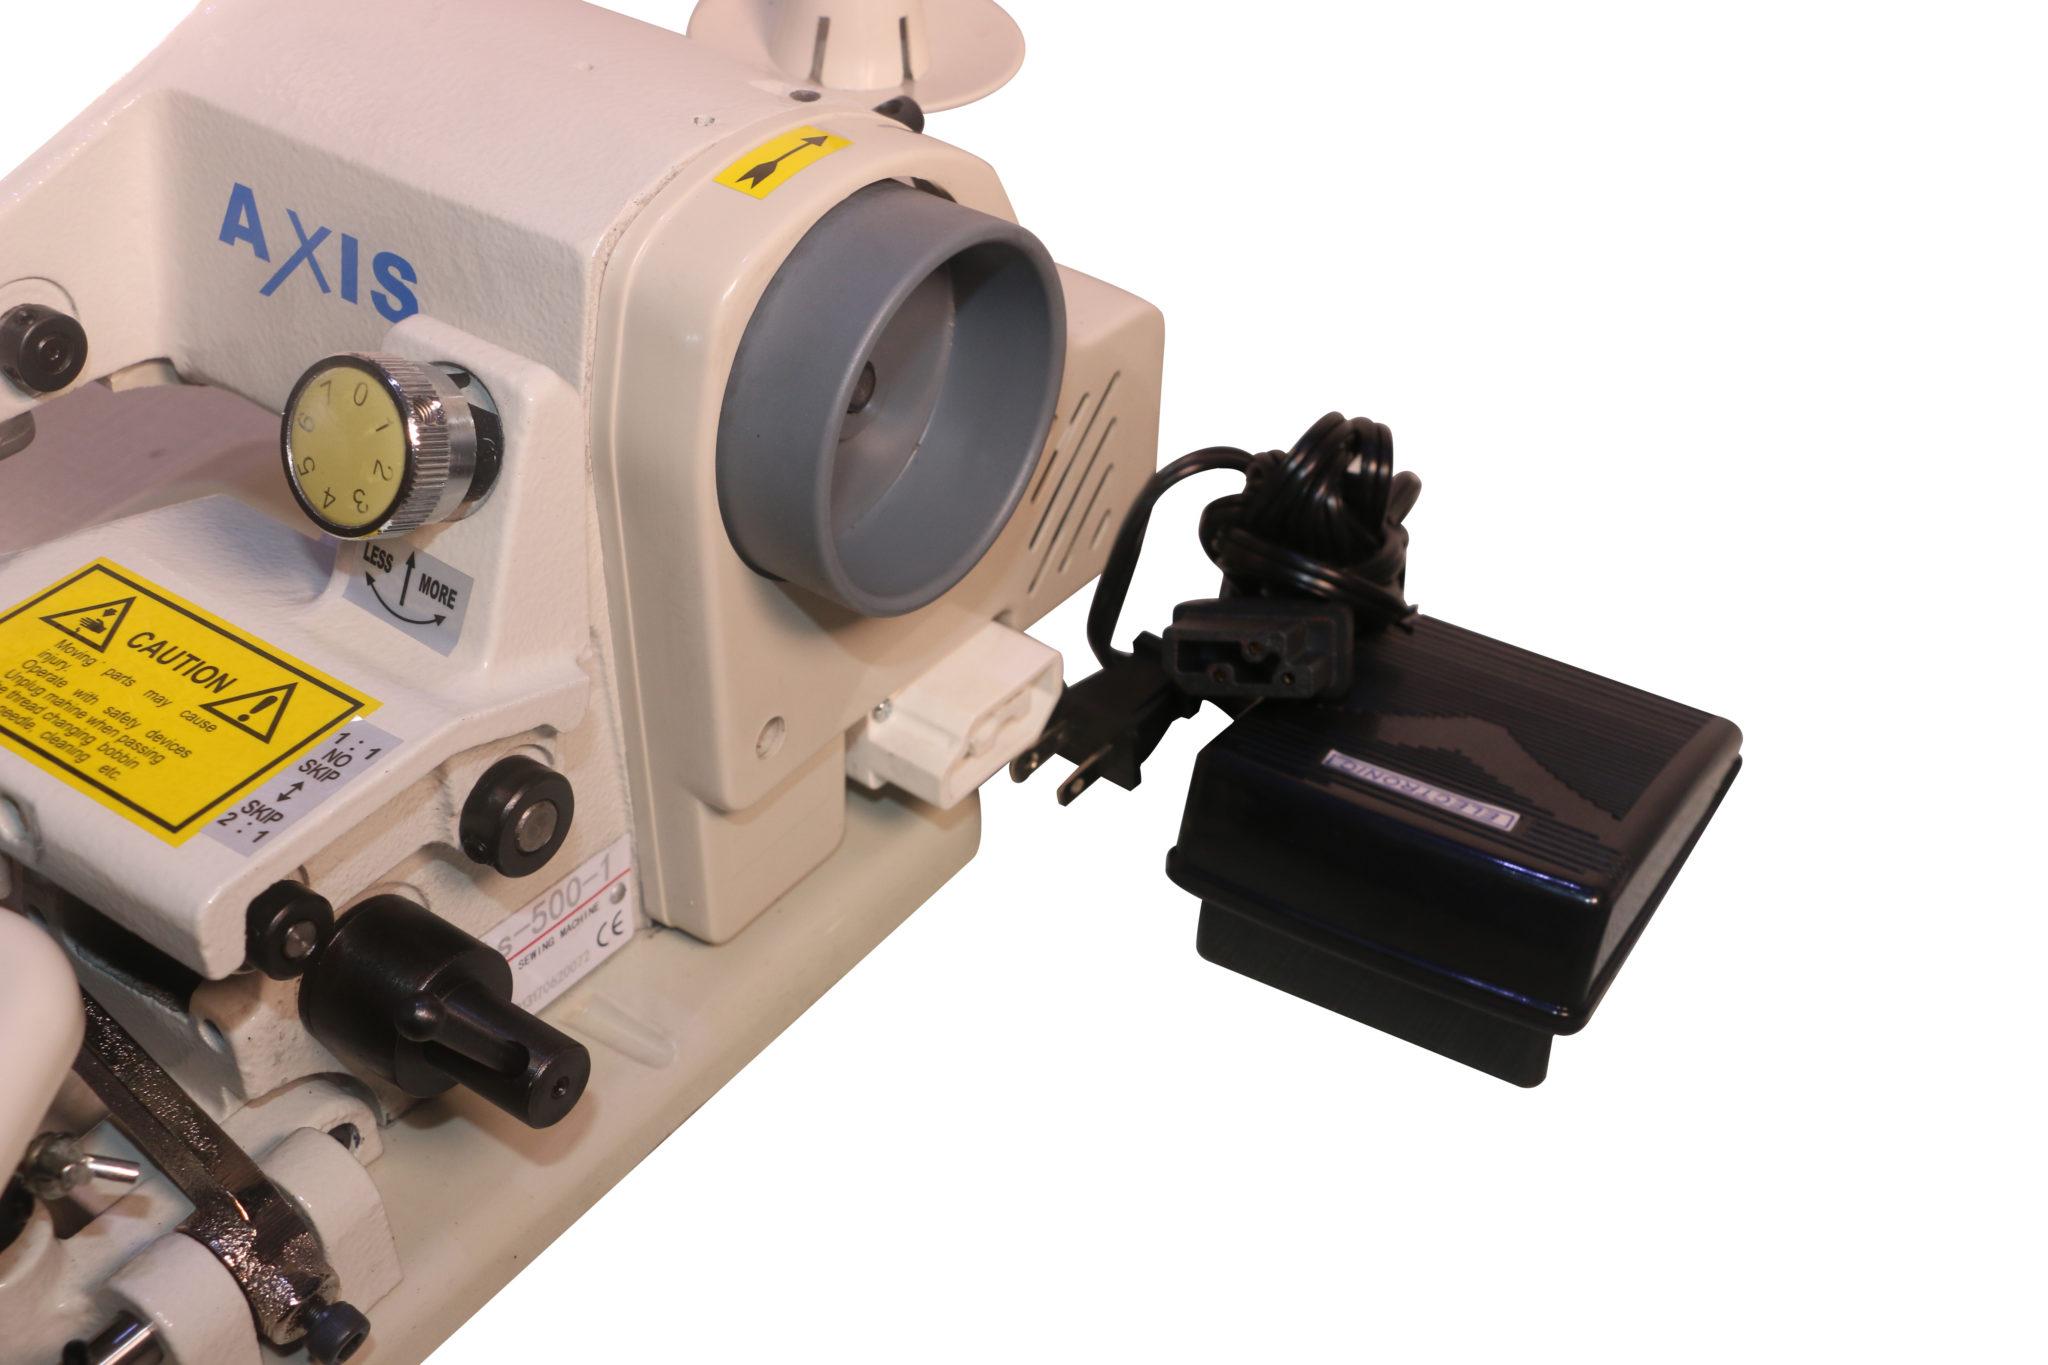 blind stitch sewing machine for sale